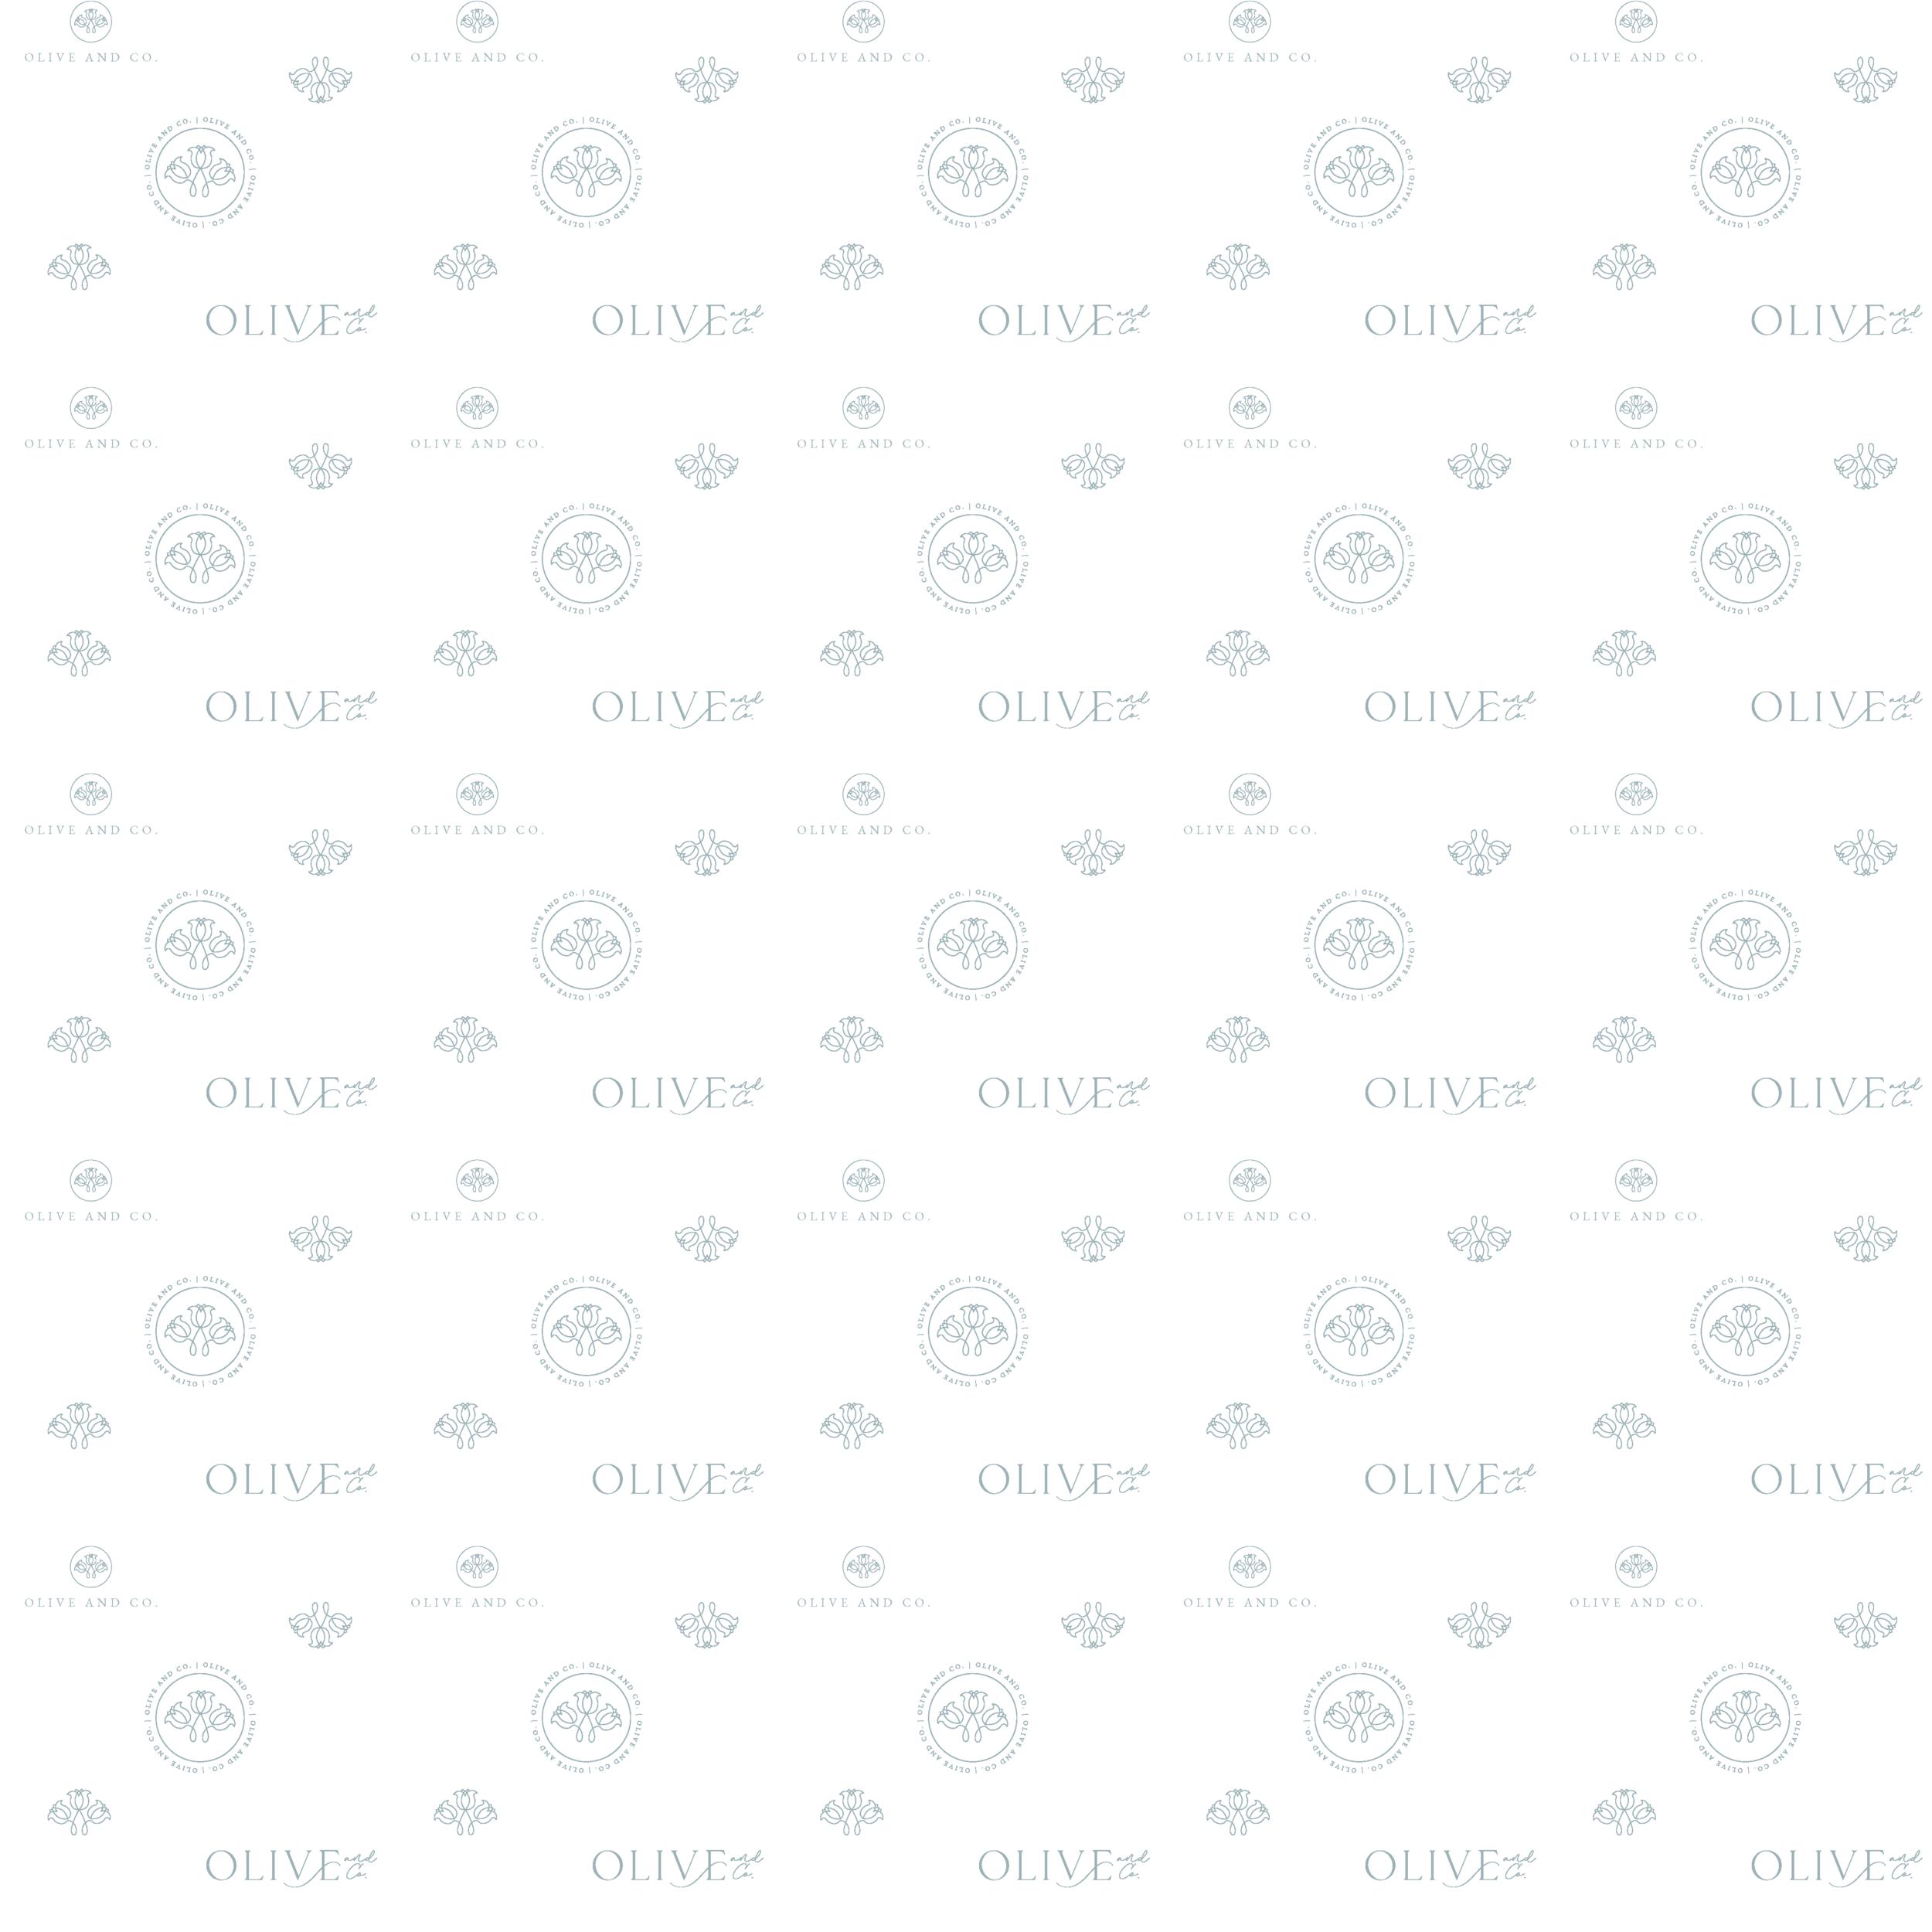 OliveCoPatterns-05.png